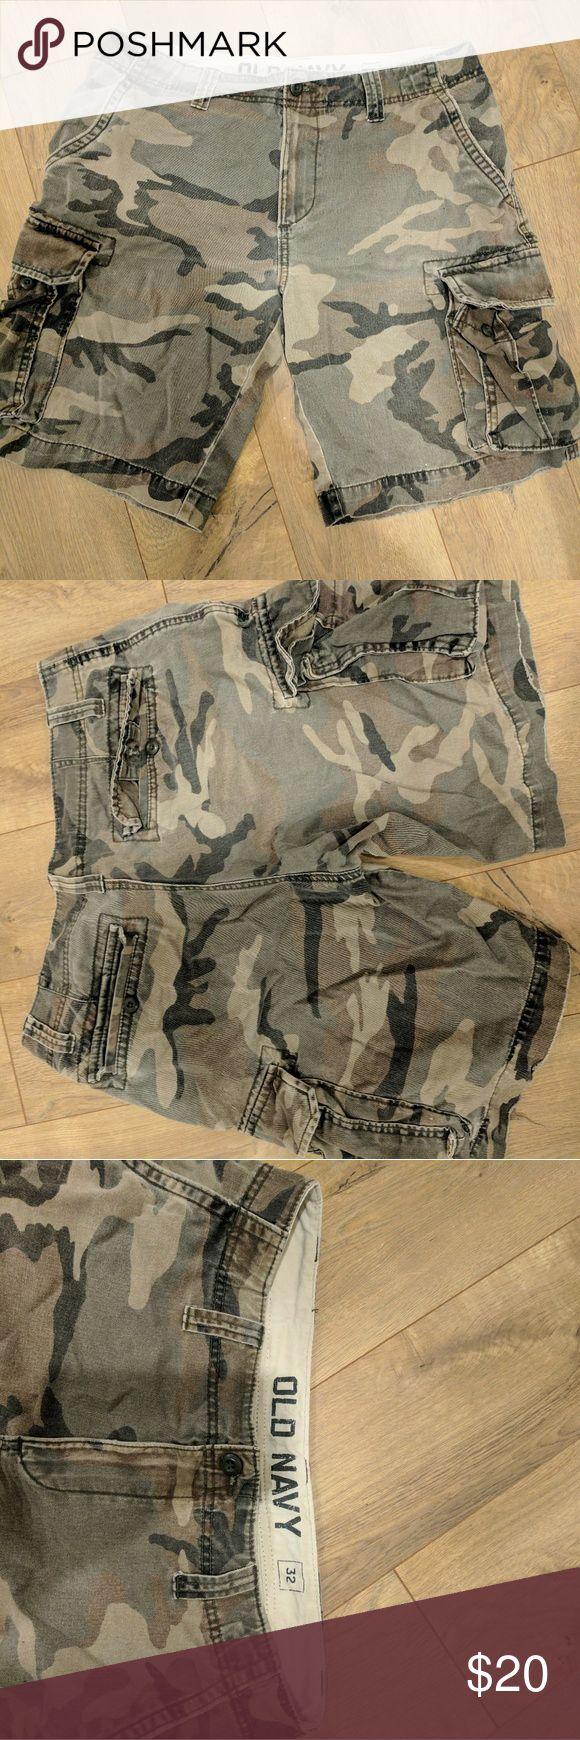 Old Navy Army Shorts Cargo army shorts Old Navy Shorts Cargos